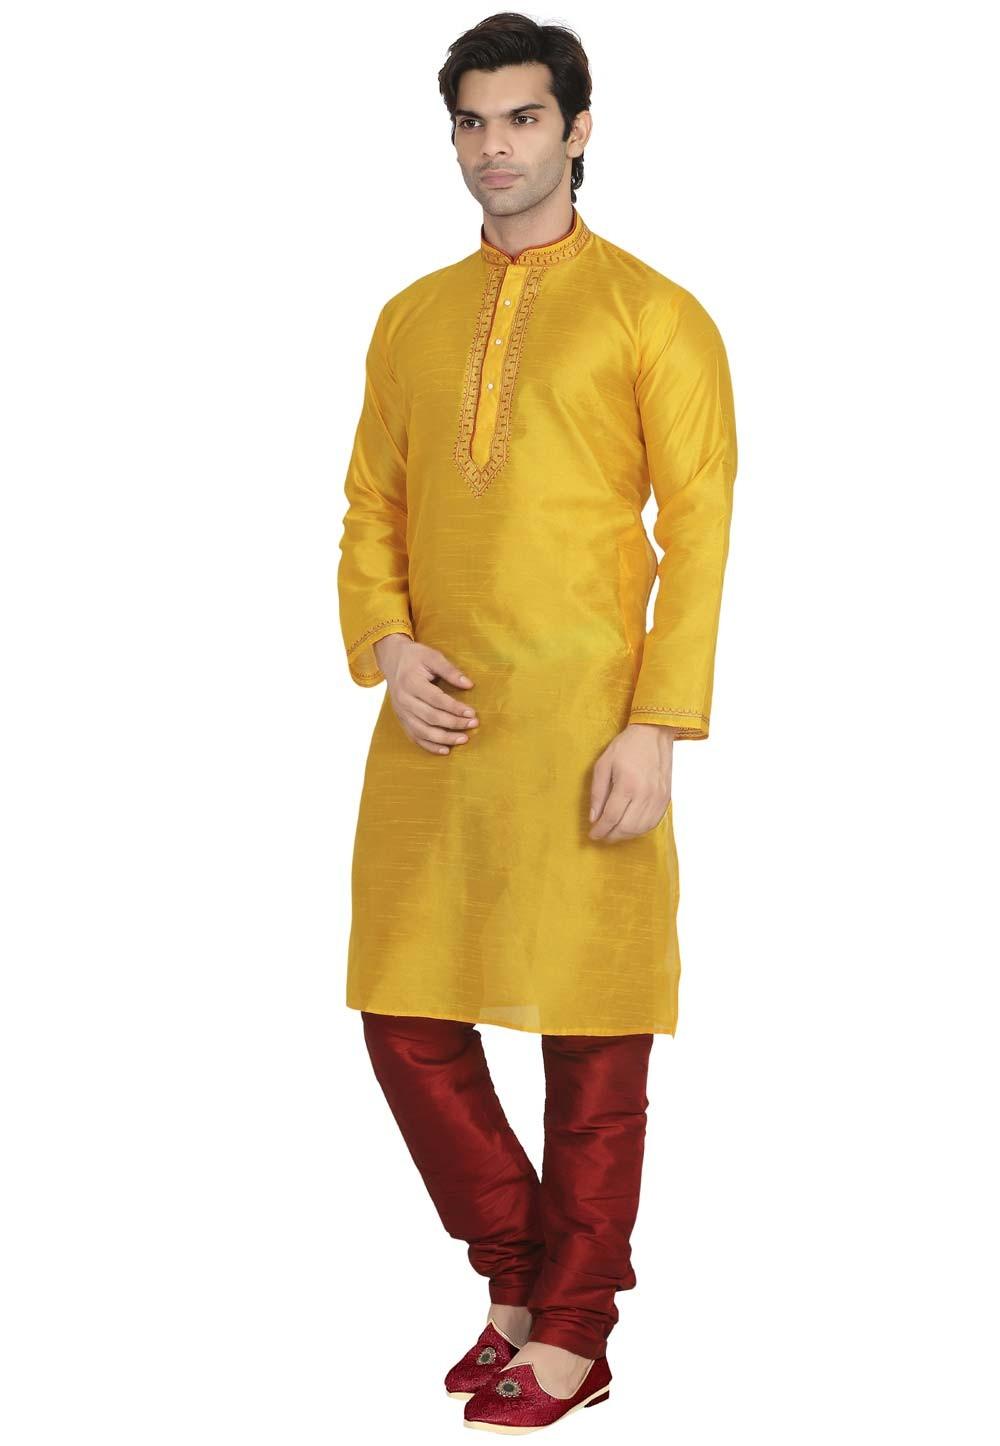 Men's Exquisite Yellow Color Dupion Silk Readymade Kurta